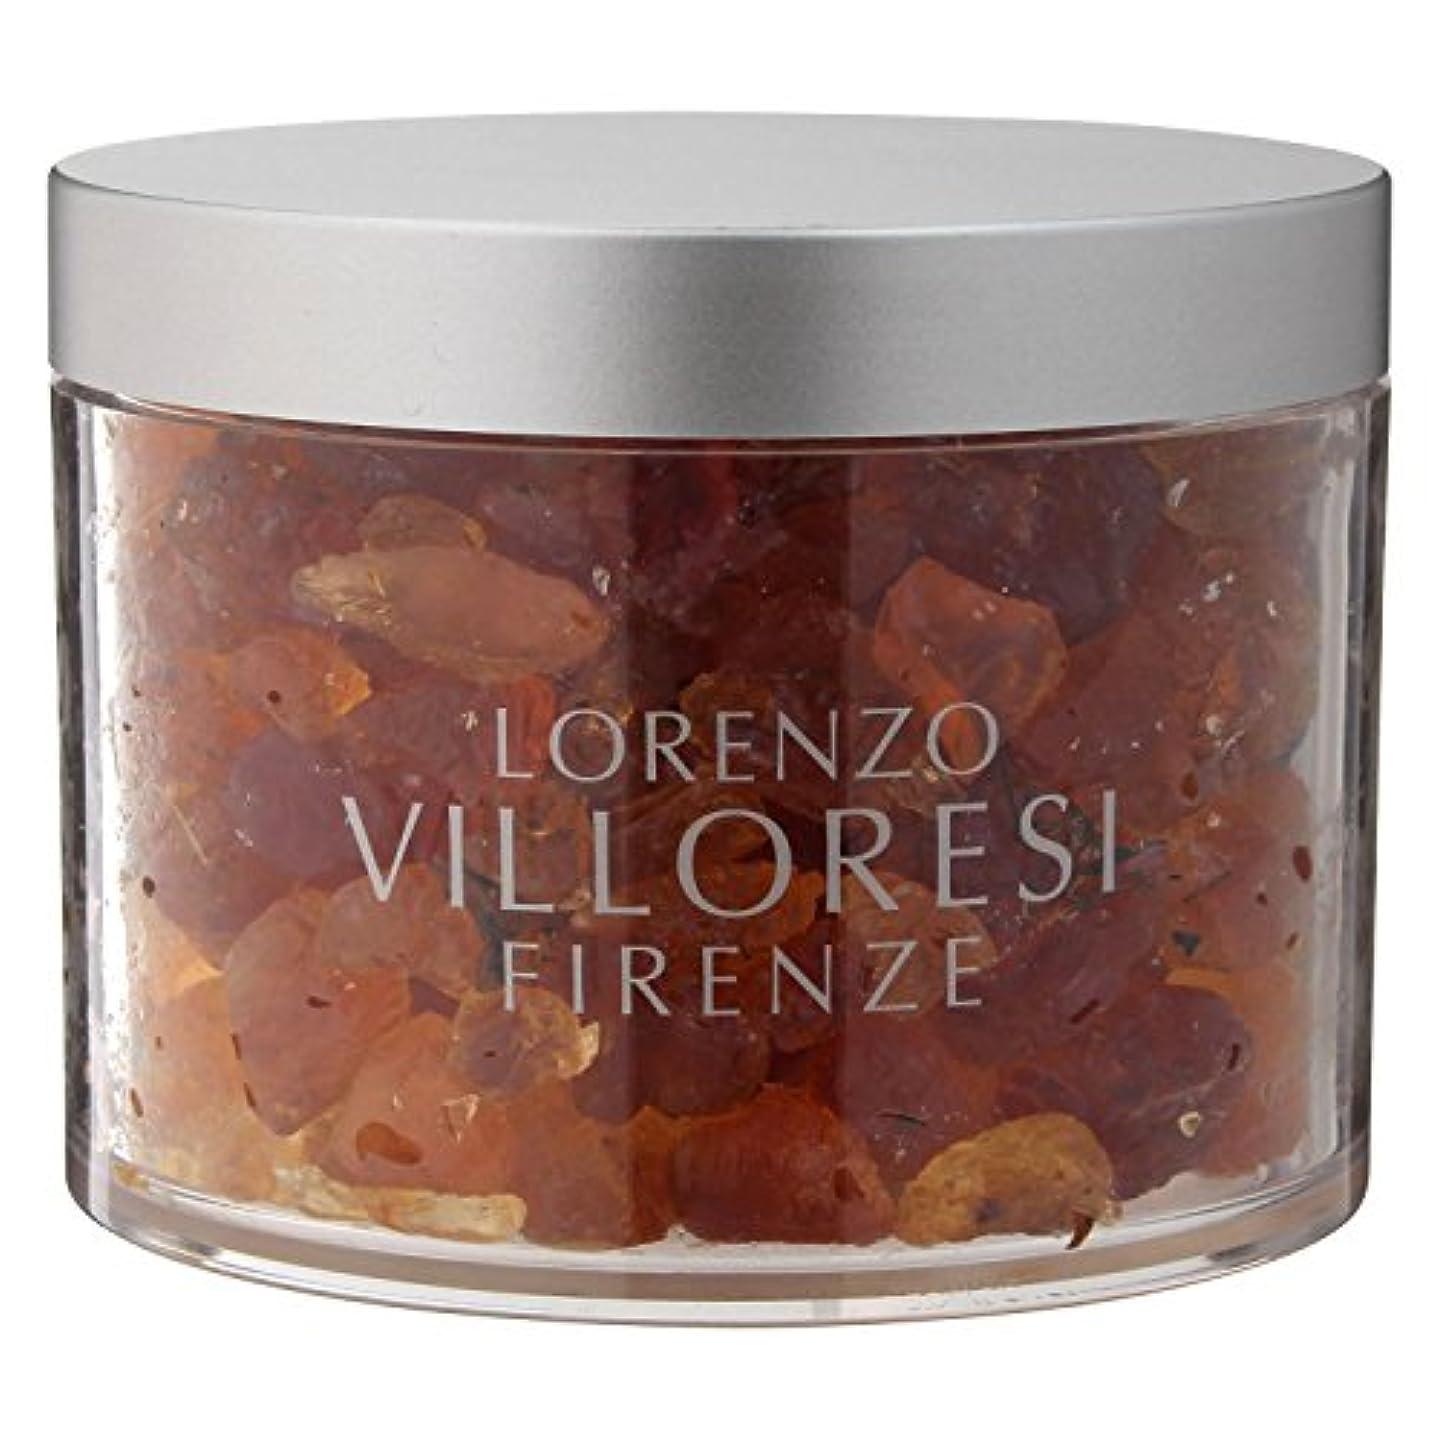 LORENZO VILLORESI センテッドクリスタル アラムート 400g